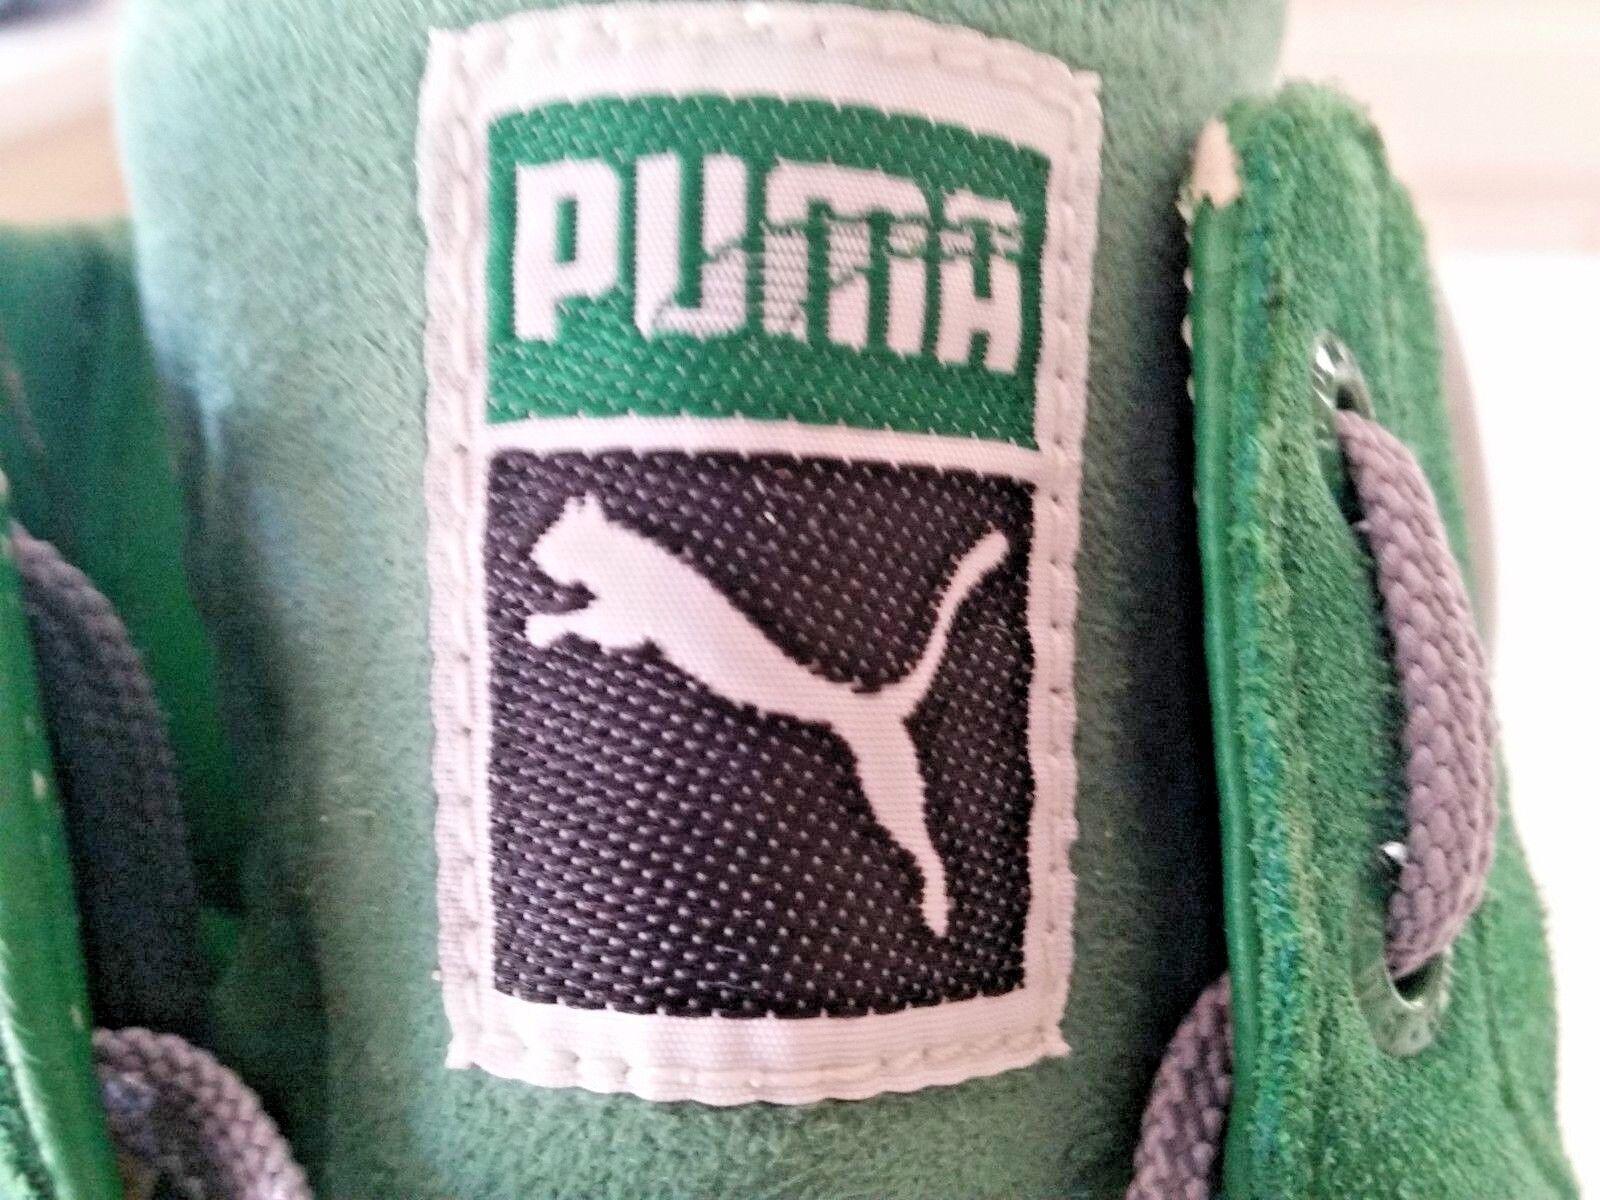 Puma primo round round round ex verde scamosciata alto 181980-06, taglia 14 d1f8c9